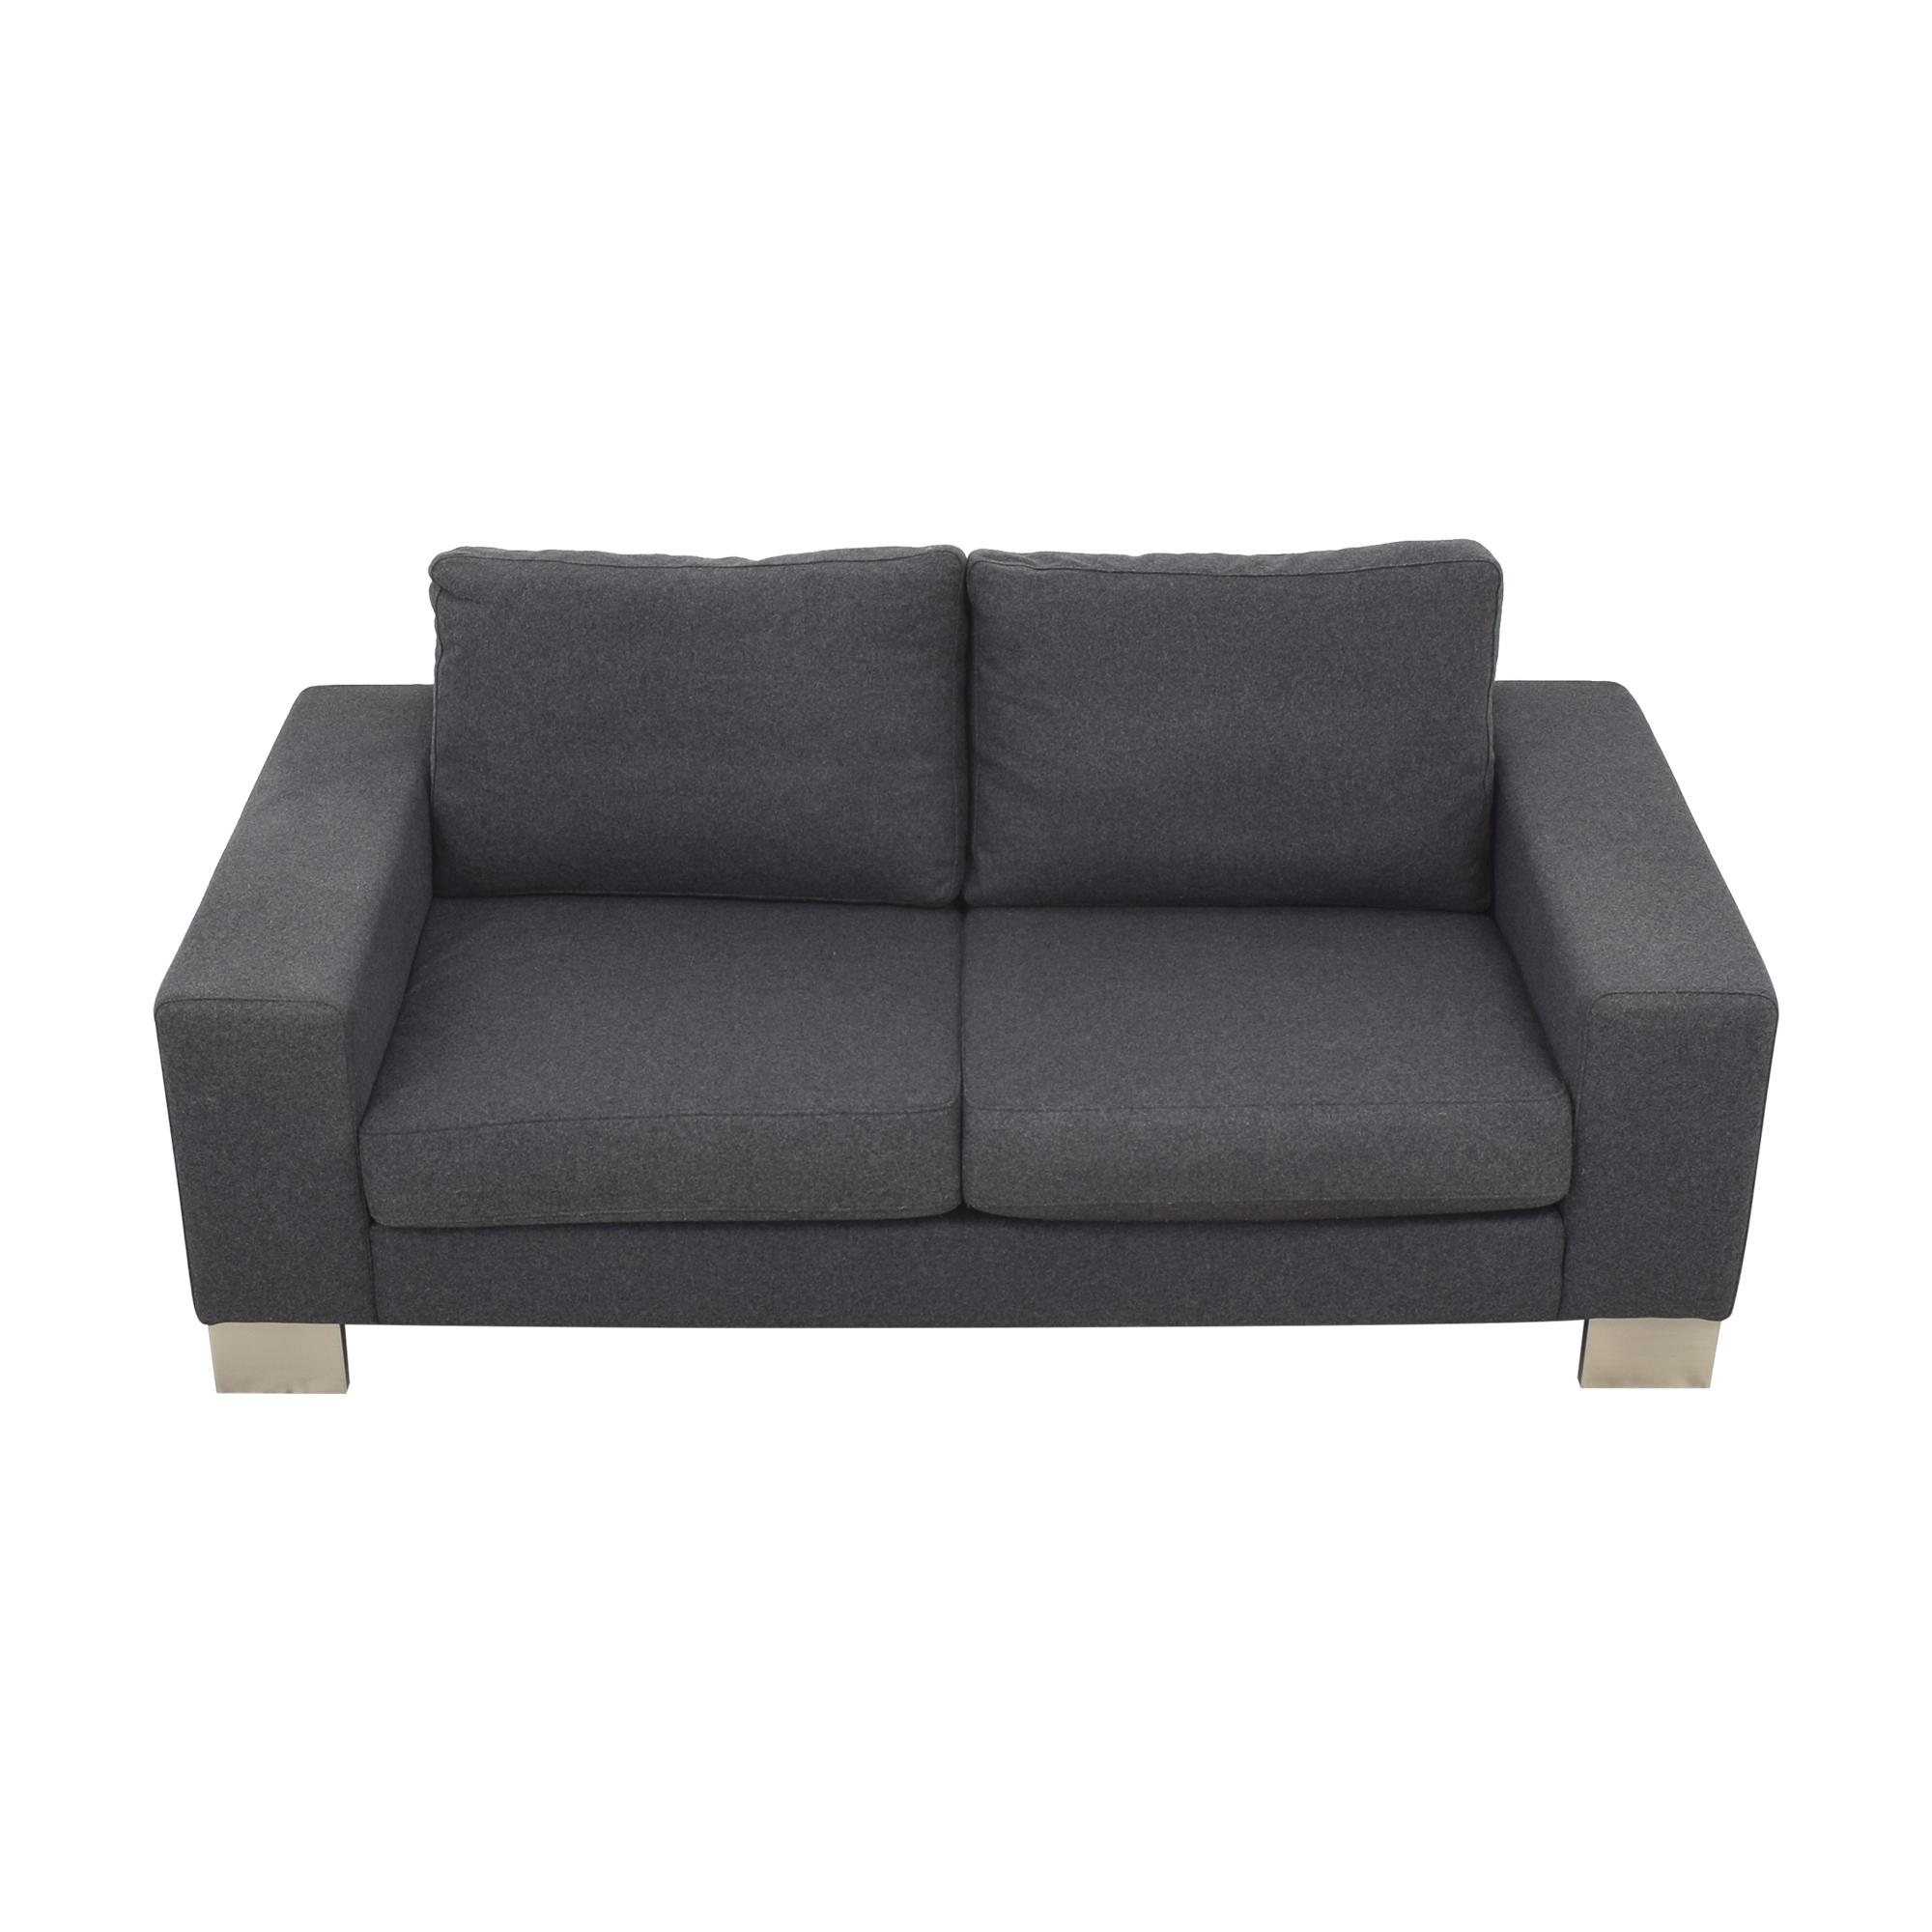 BoConcept Bo Concept Indivi Couch dark blue and silver